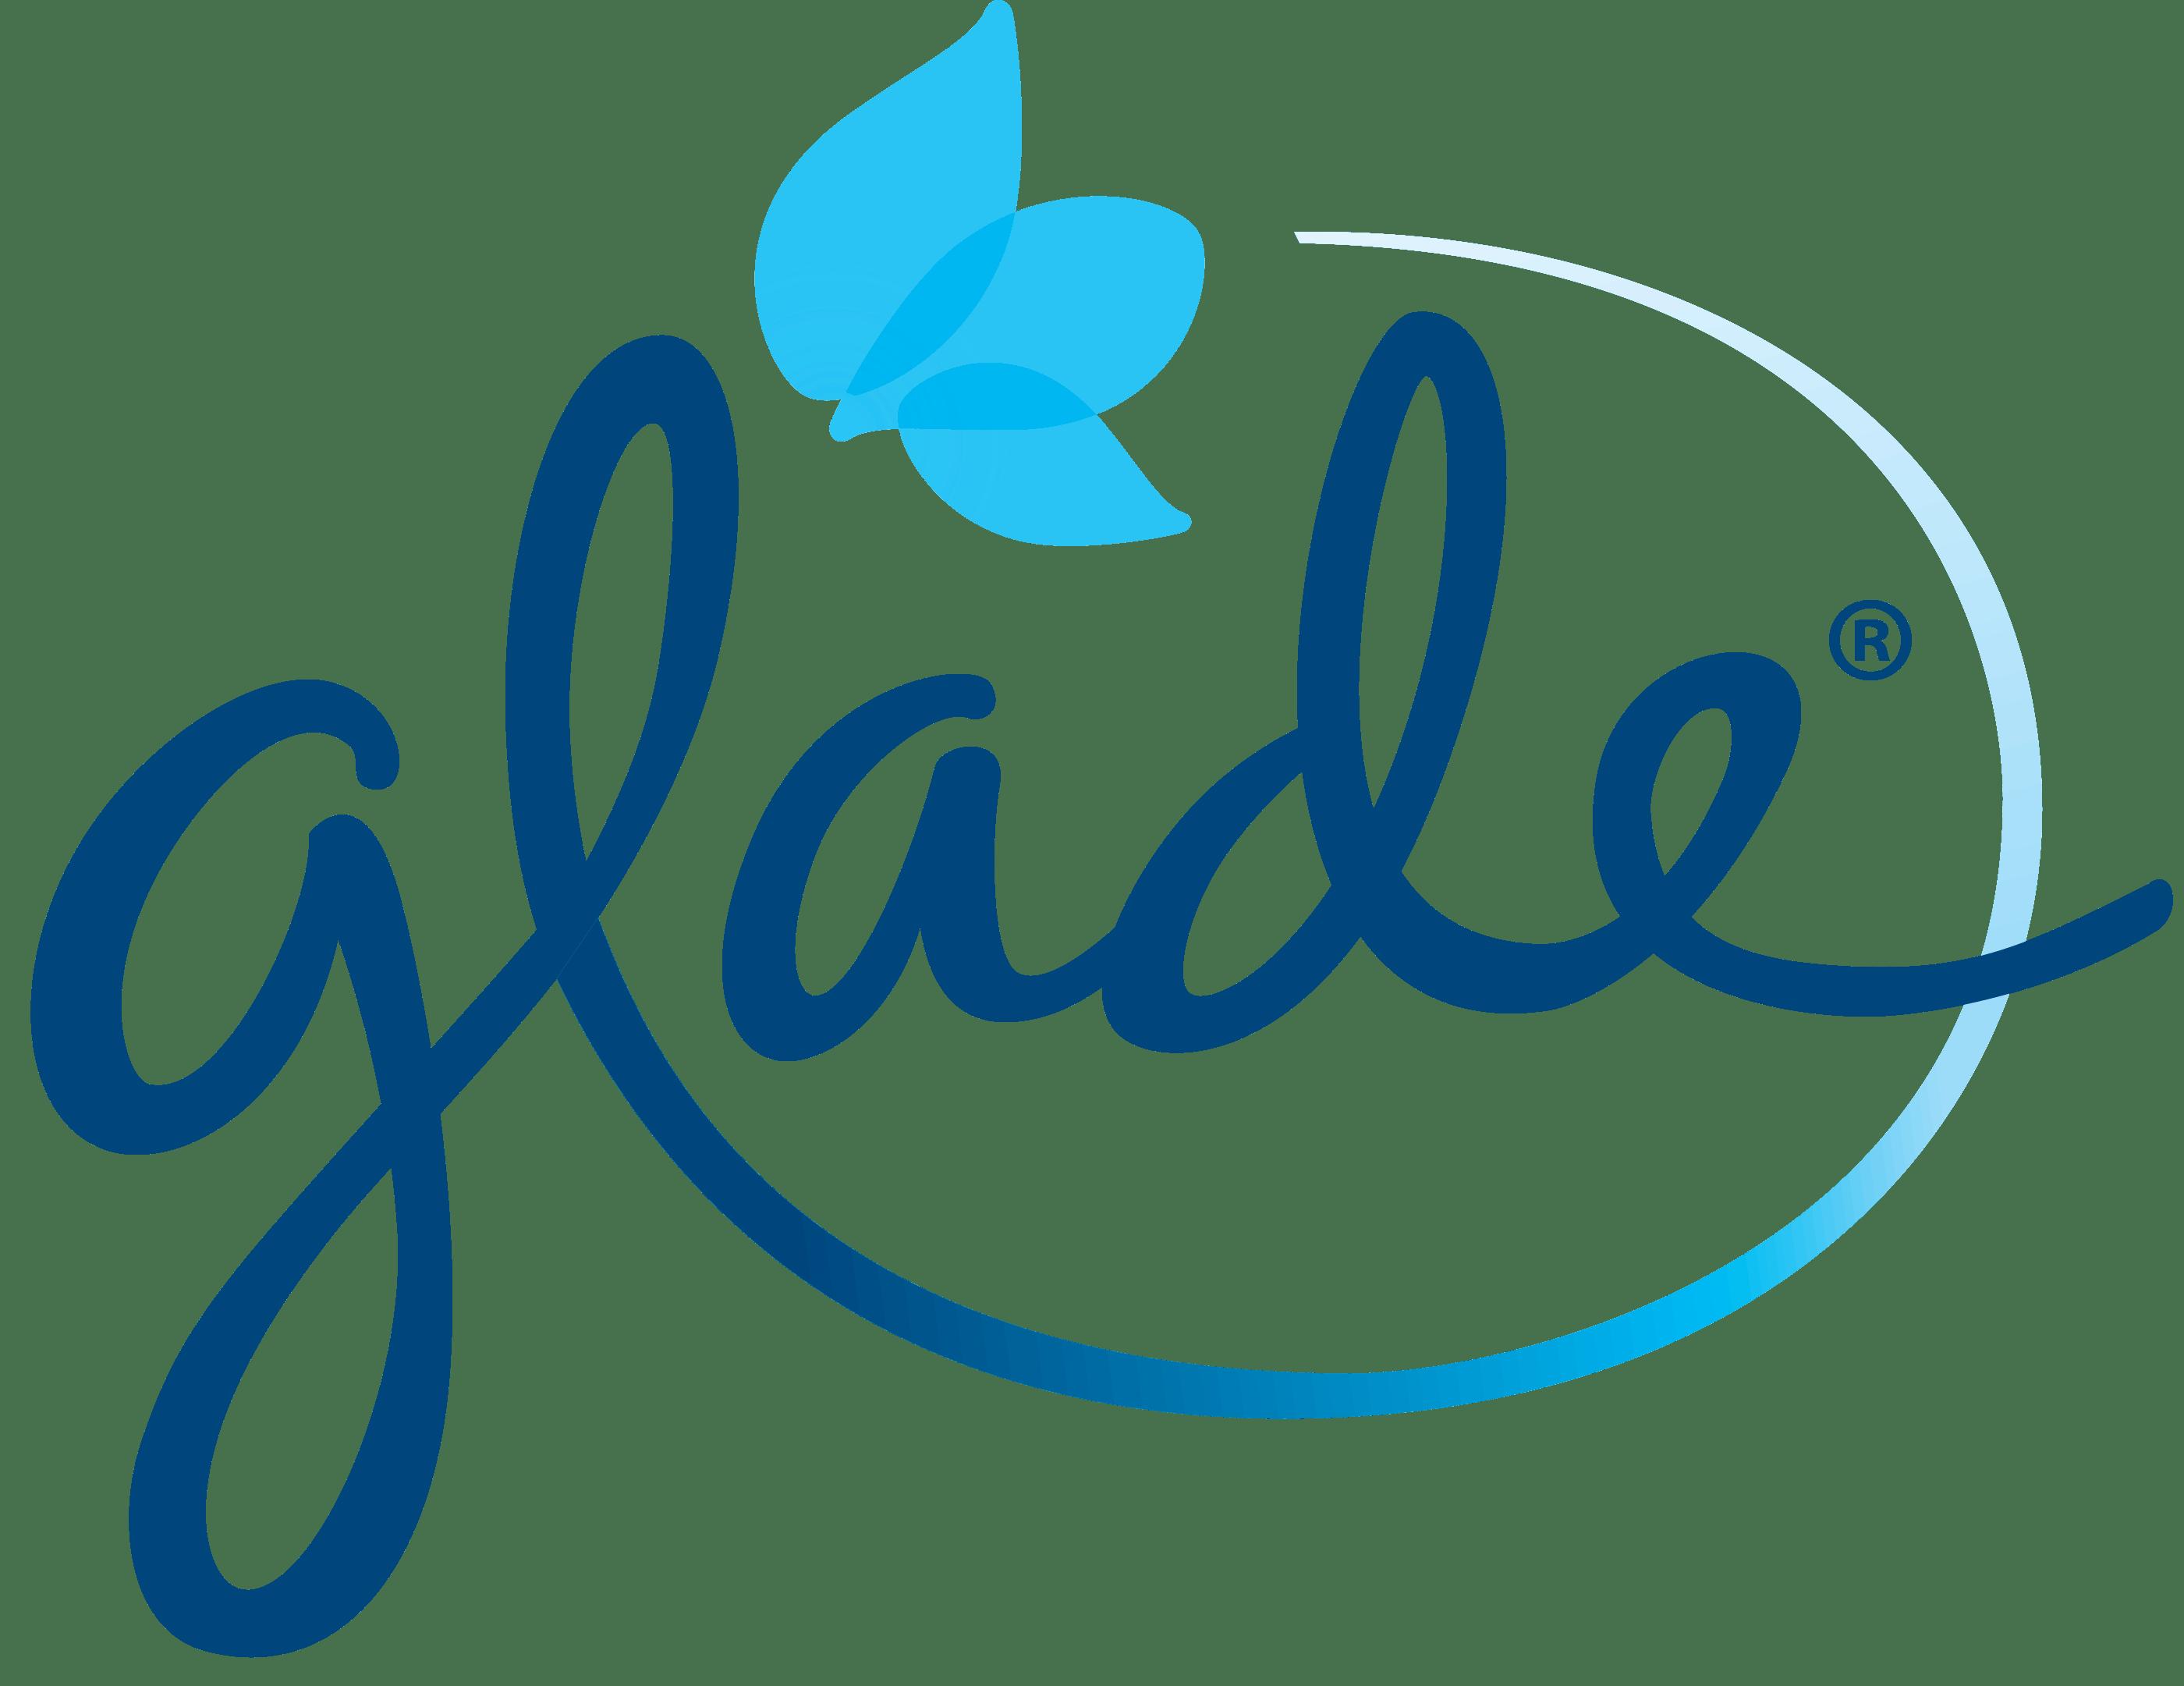 Glade Logo 2014 4c POS LG F 3 212